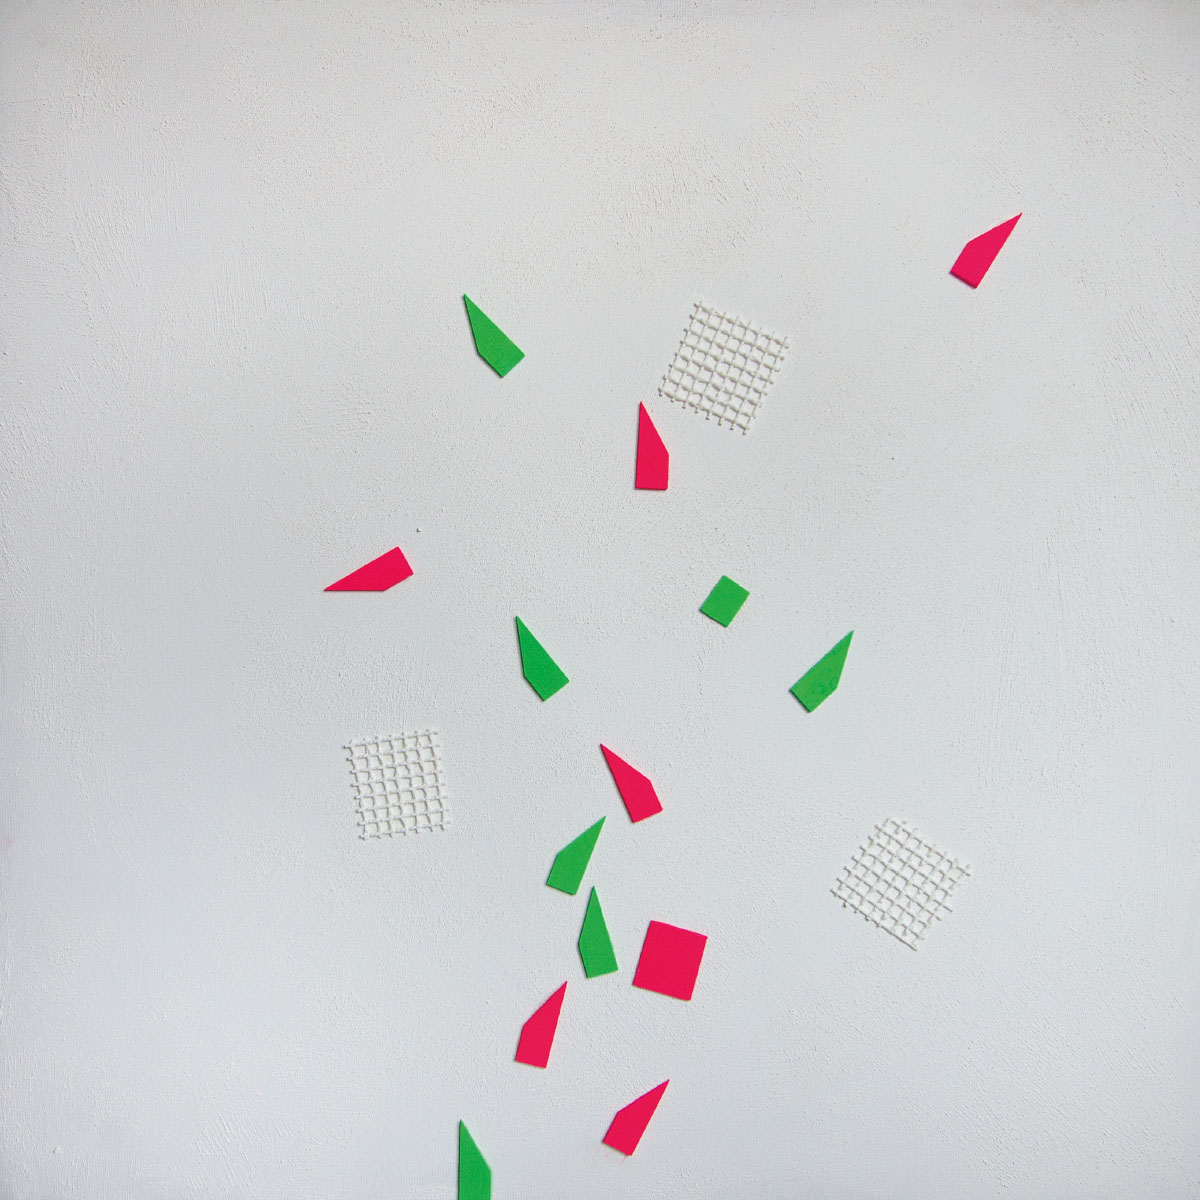 Fivesenses (Cubo) Touch, acrylic, graphite, plexiglass, pigment, plastic mesh on canvas, 80x80x80 cm